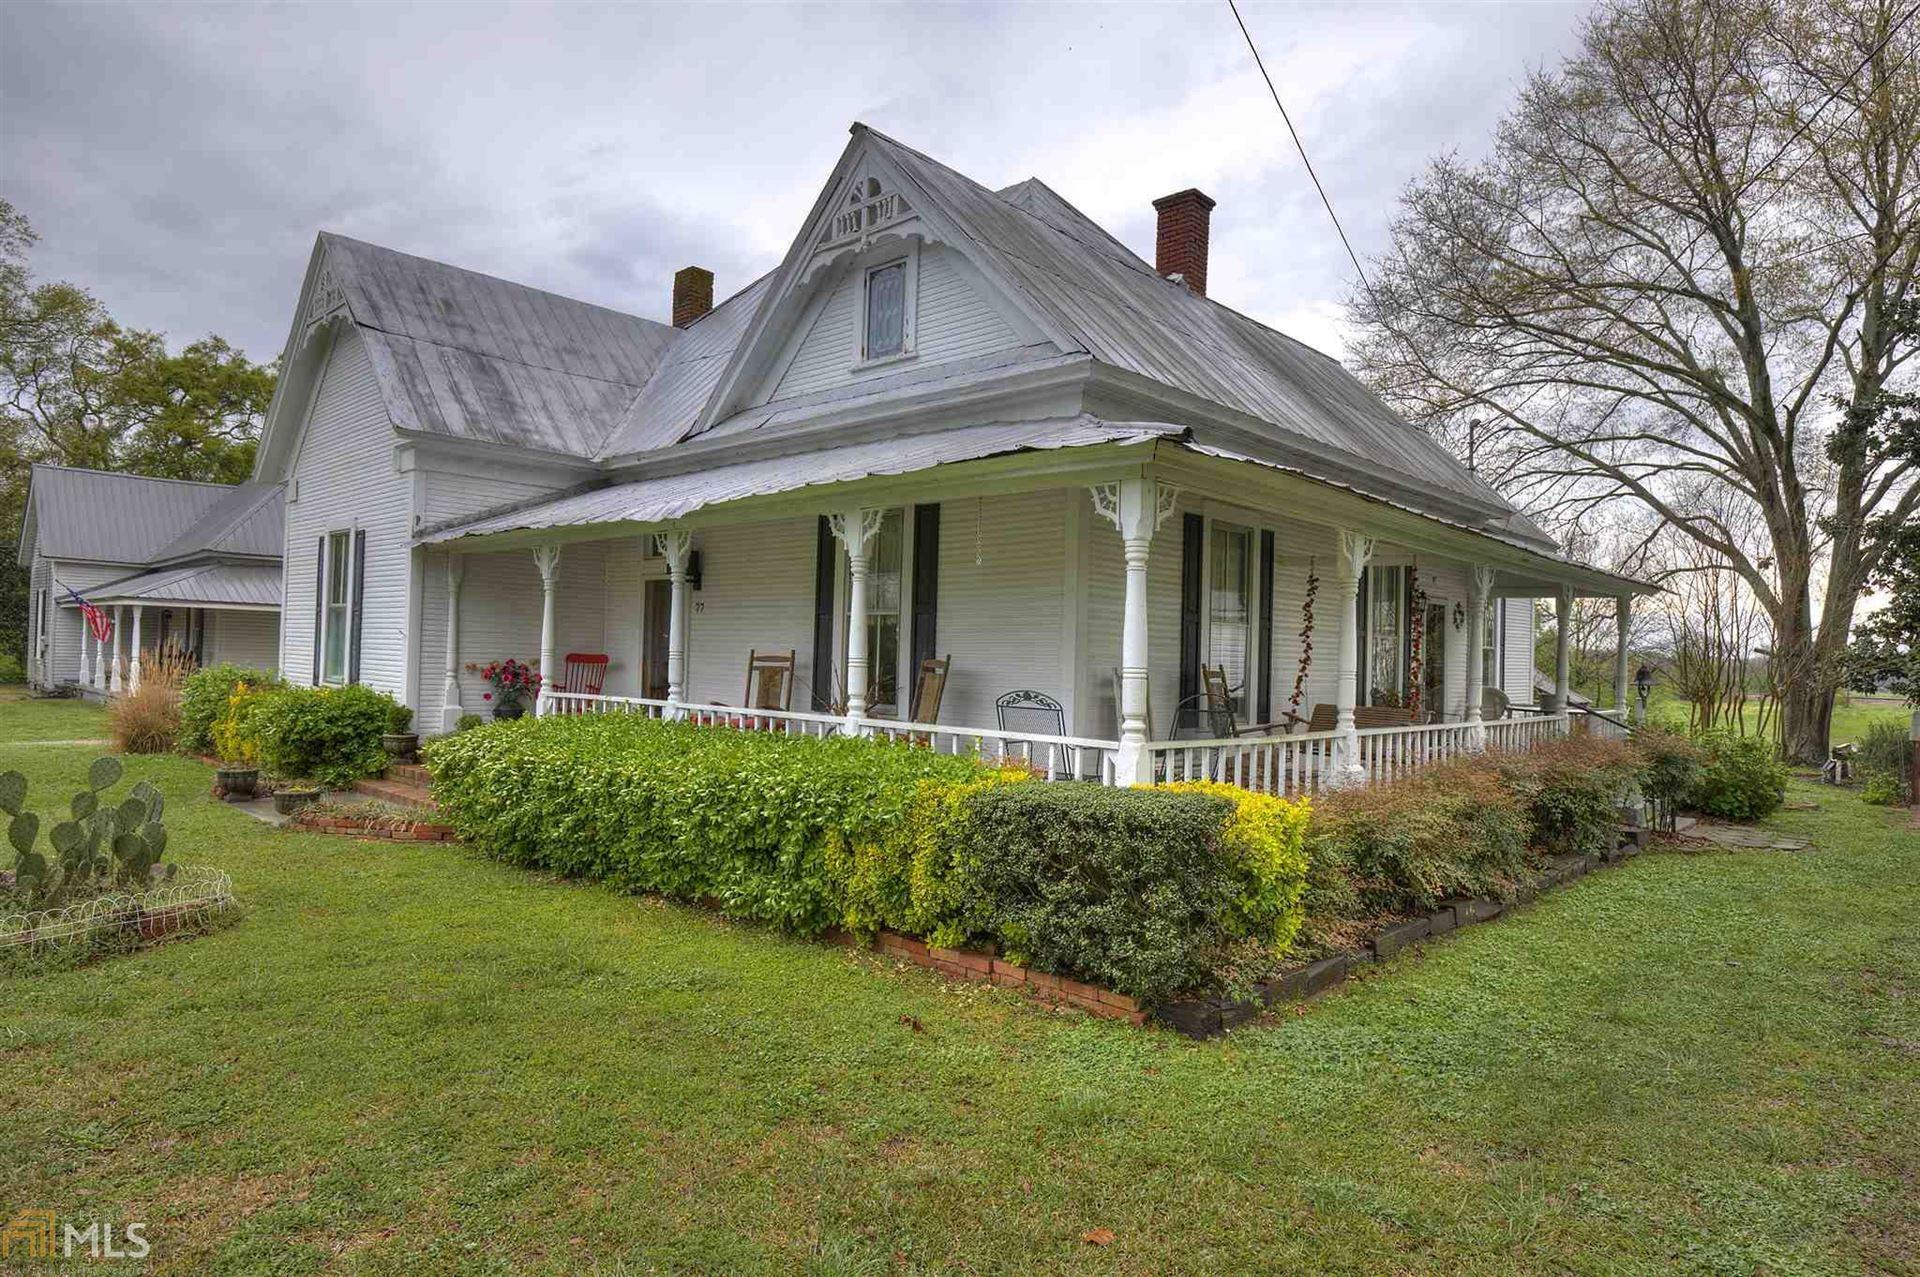 77 Main St, Taylorsville, GA 30178 - MLS#: 8954533